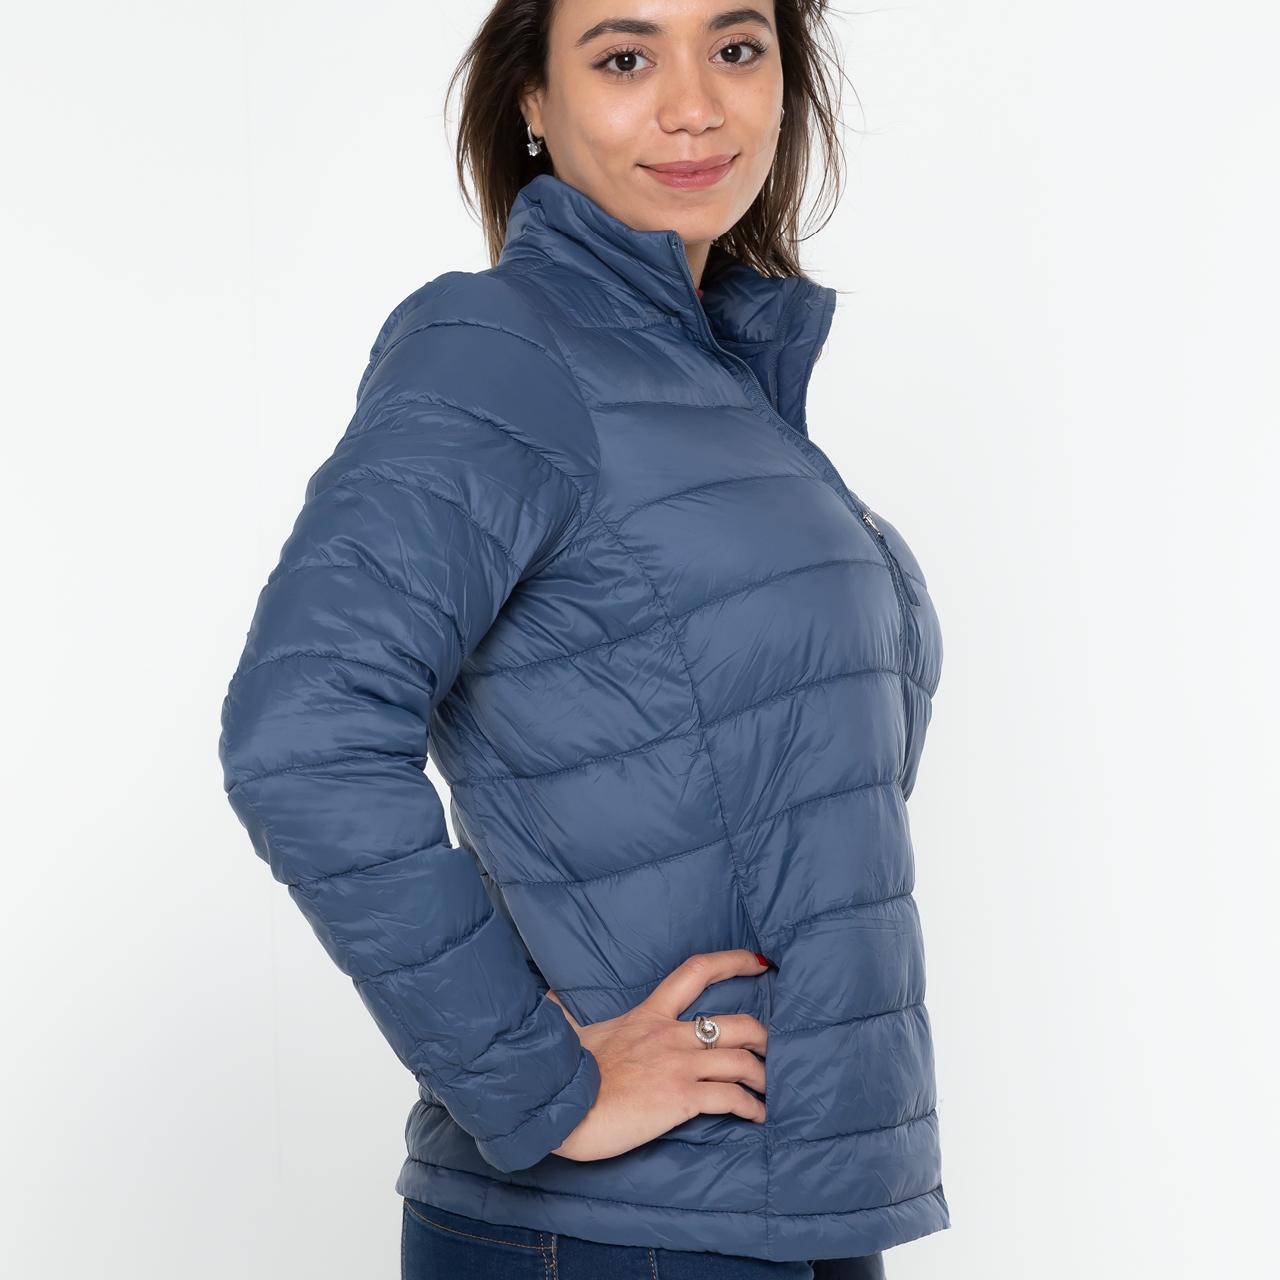 Damen Steppjacke in blau L/XL